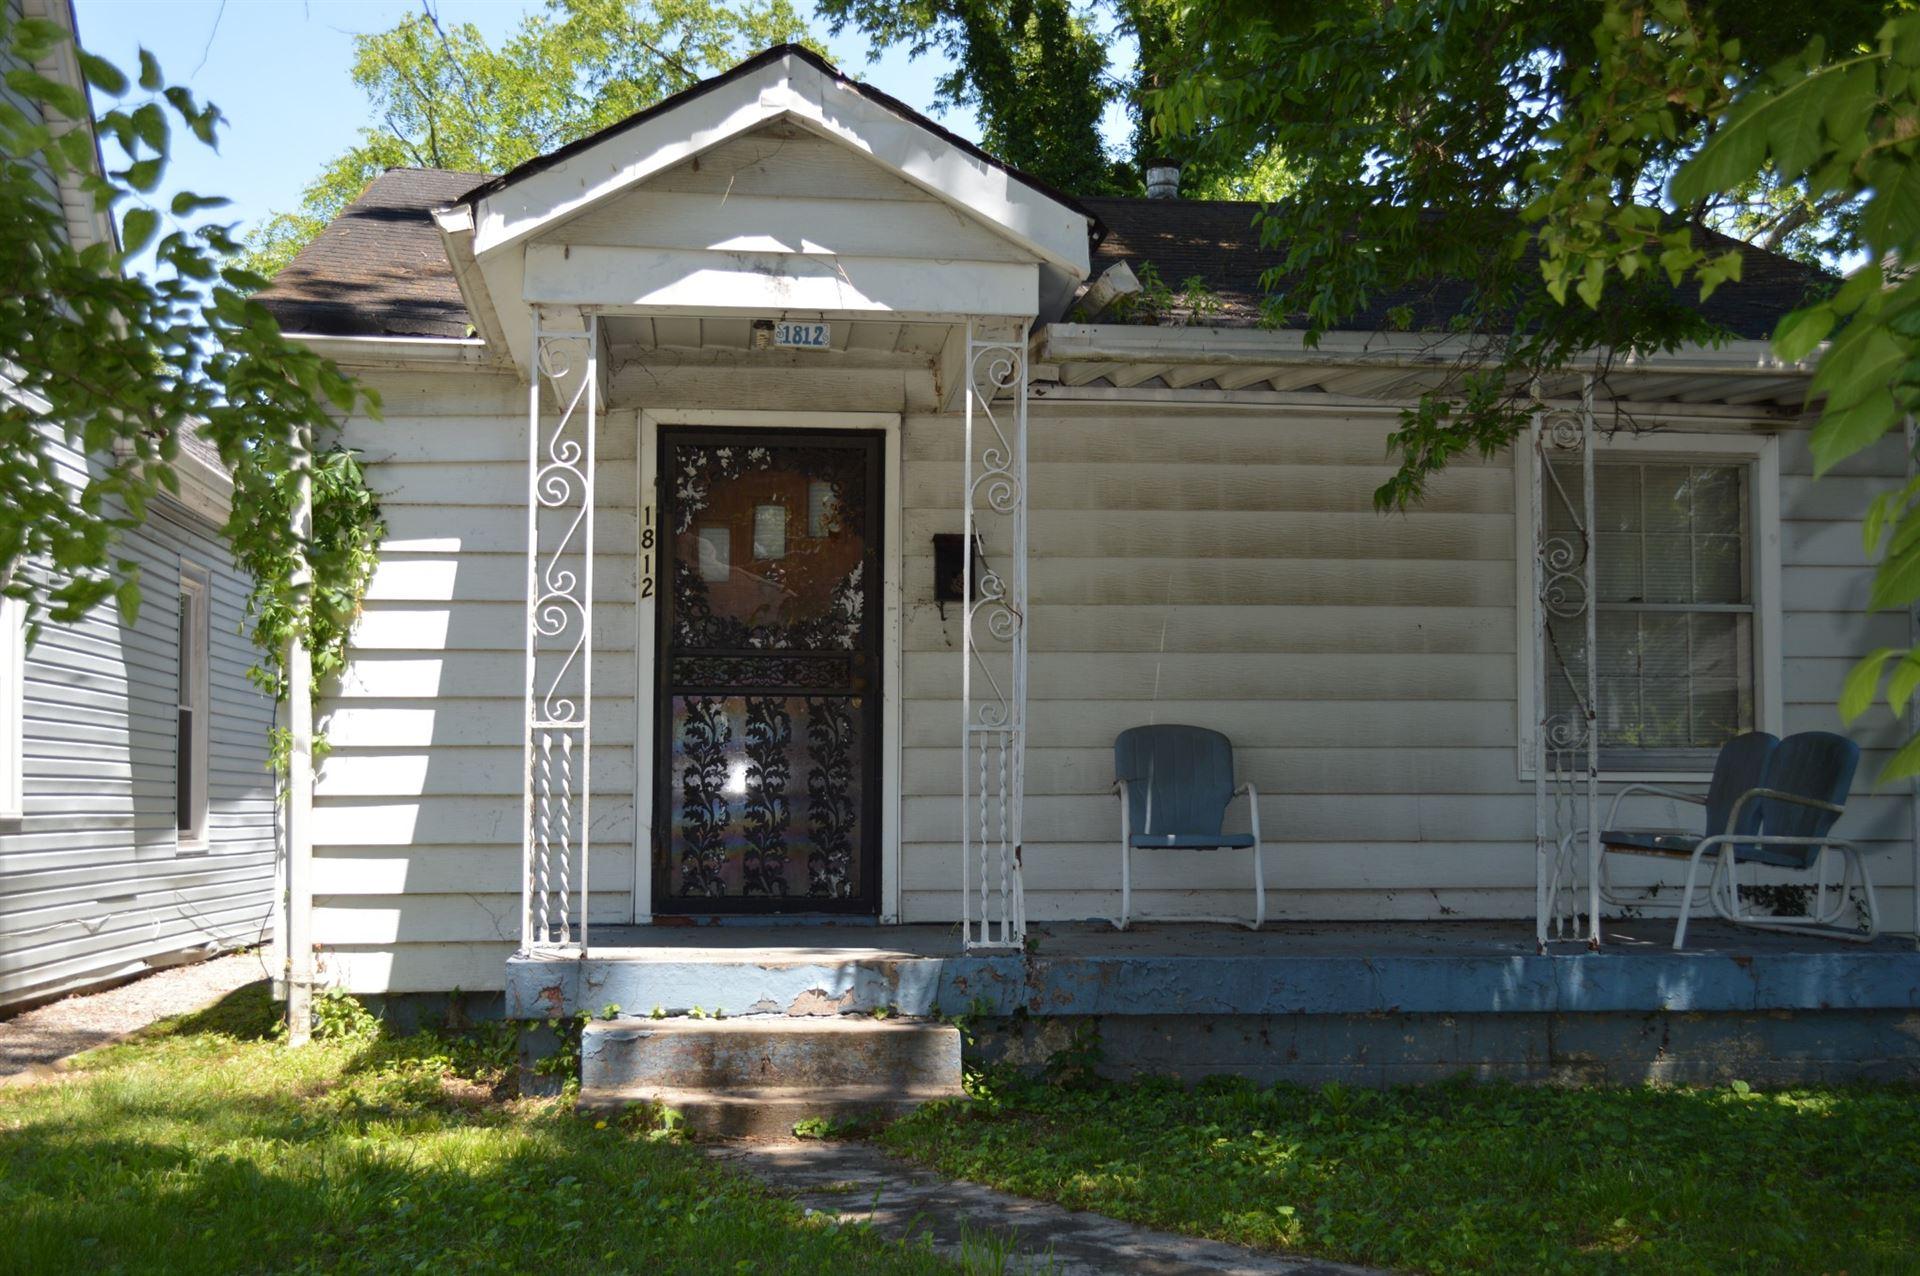 1812 10th Ave N, Nashville, TN 37208 - MLS#: 2258352